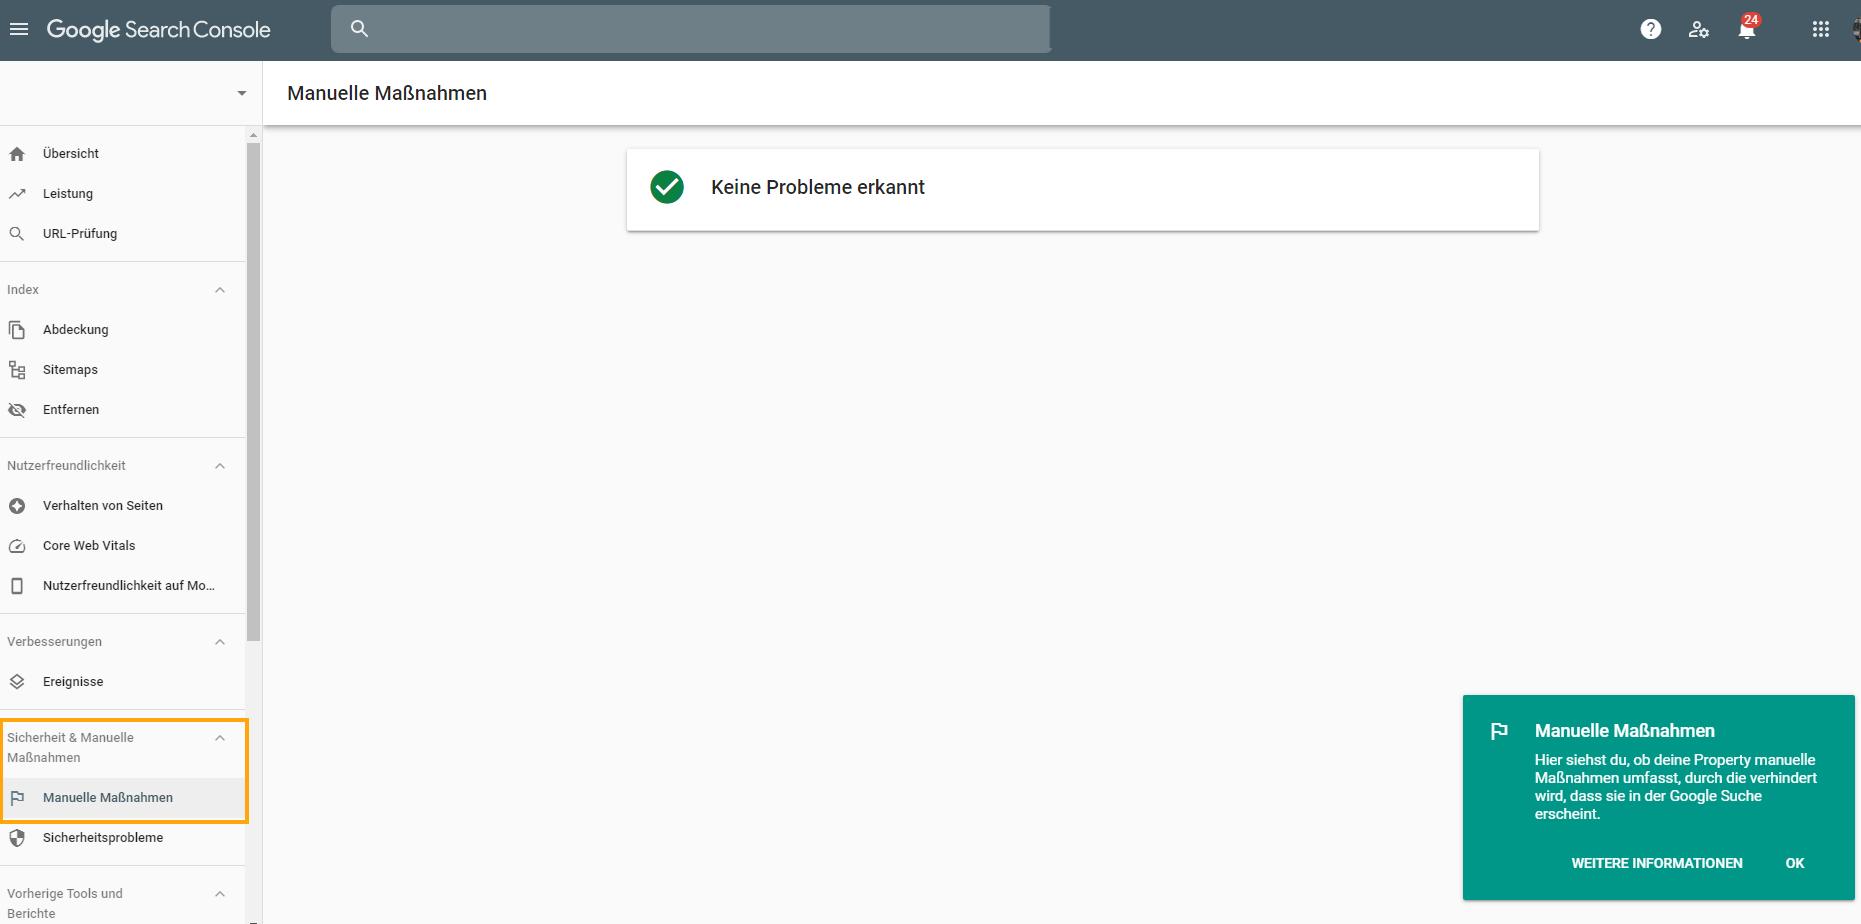 Screenshot der Google Search Console des Bereichs Manuelle Maßnahmen